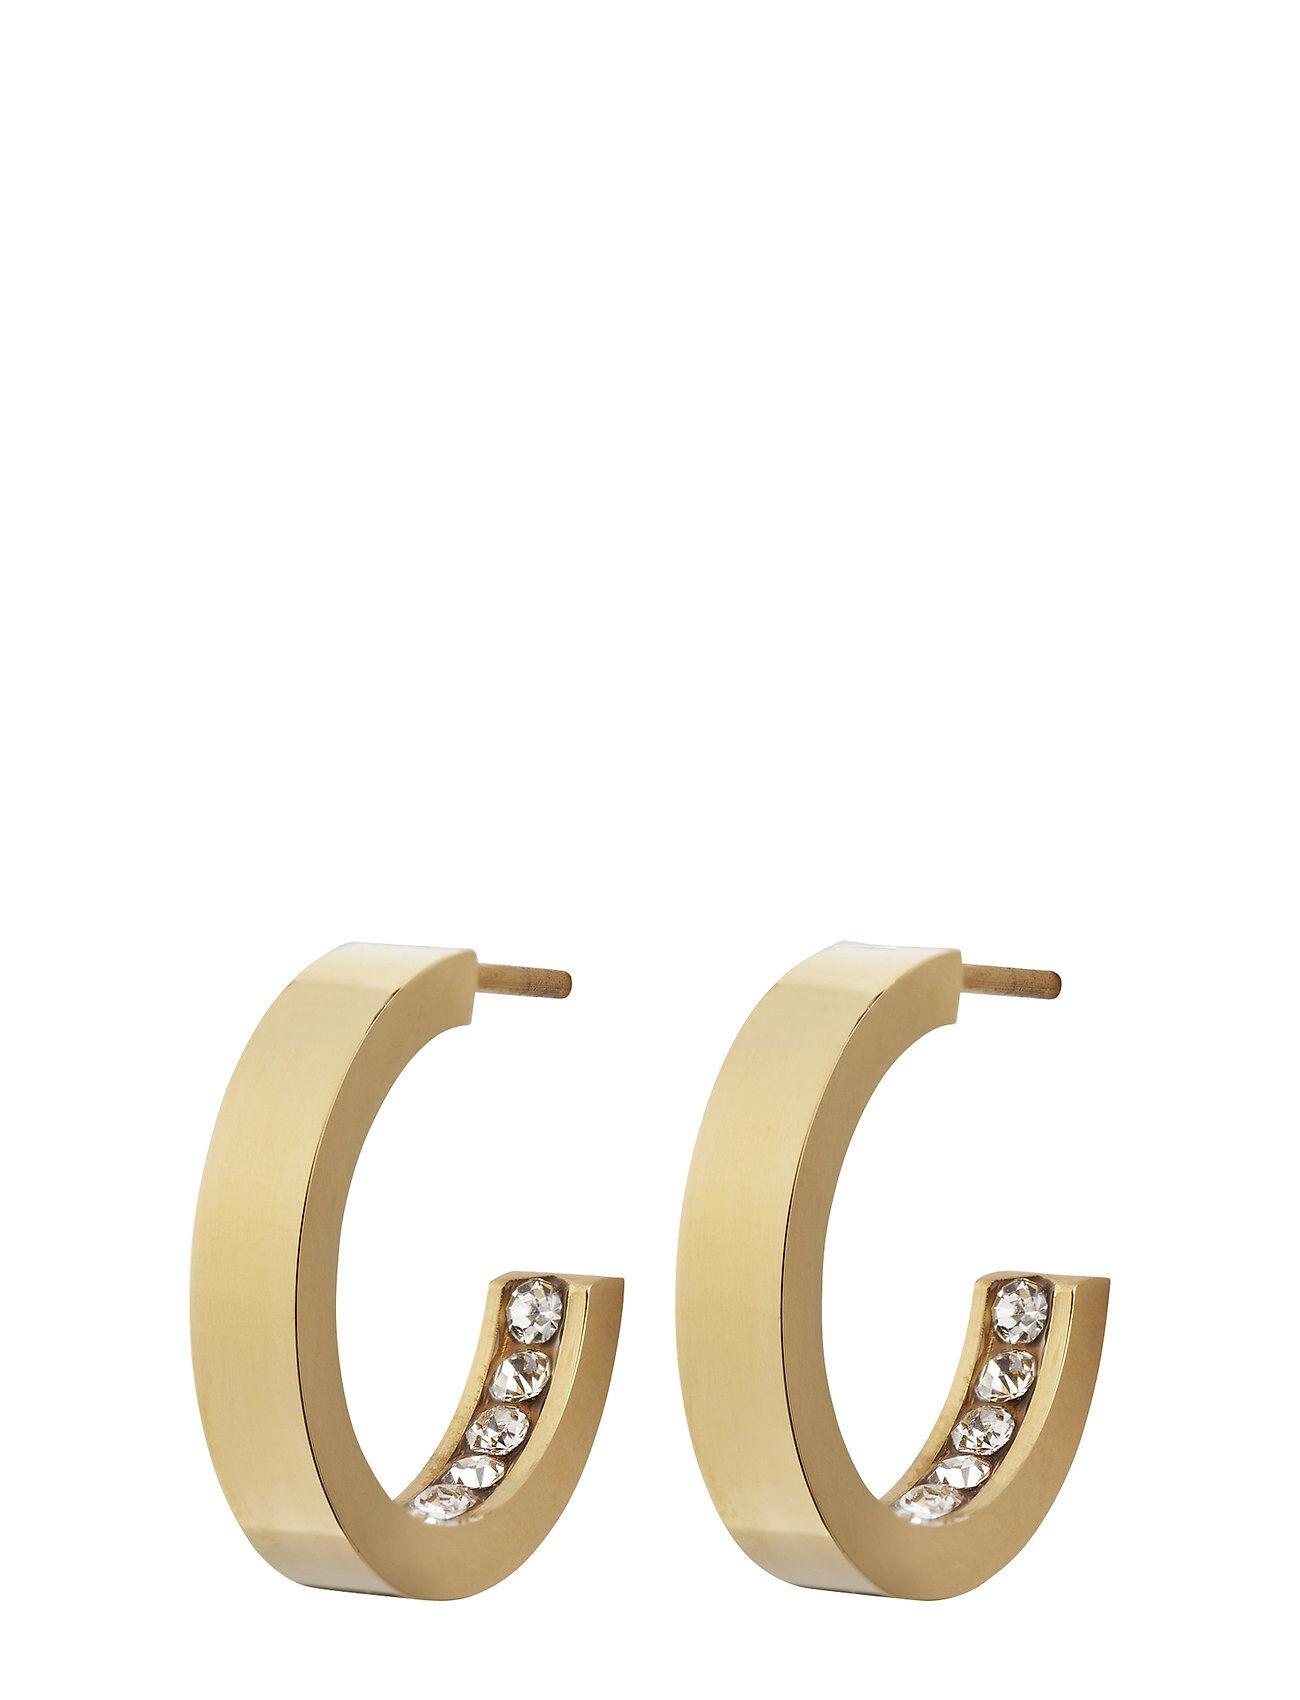 Edblad Monaco Earrings Mini Accessories Jewellery Earrings Hoops Kulta Edblad